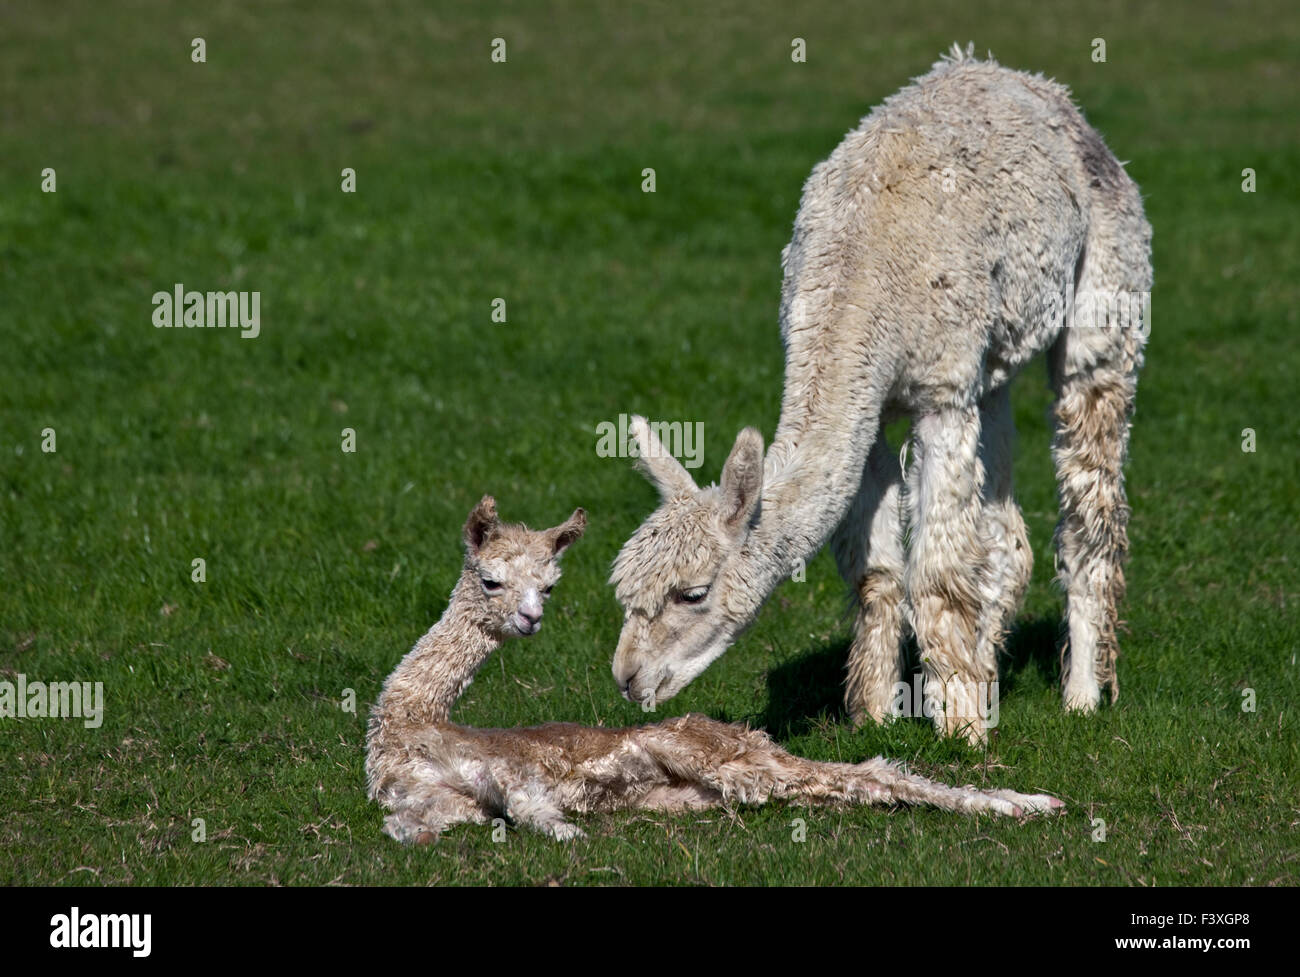 Adult and Baby Alpacas bonding (vicugna pacos) - Stock Image